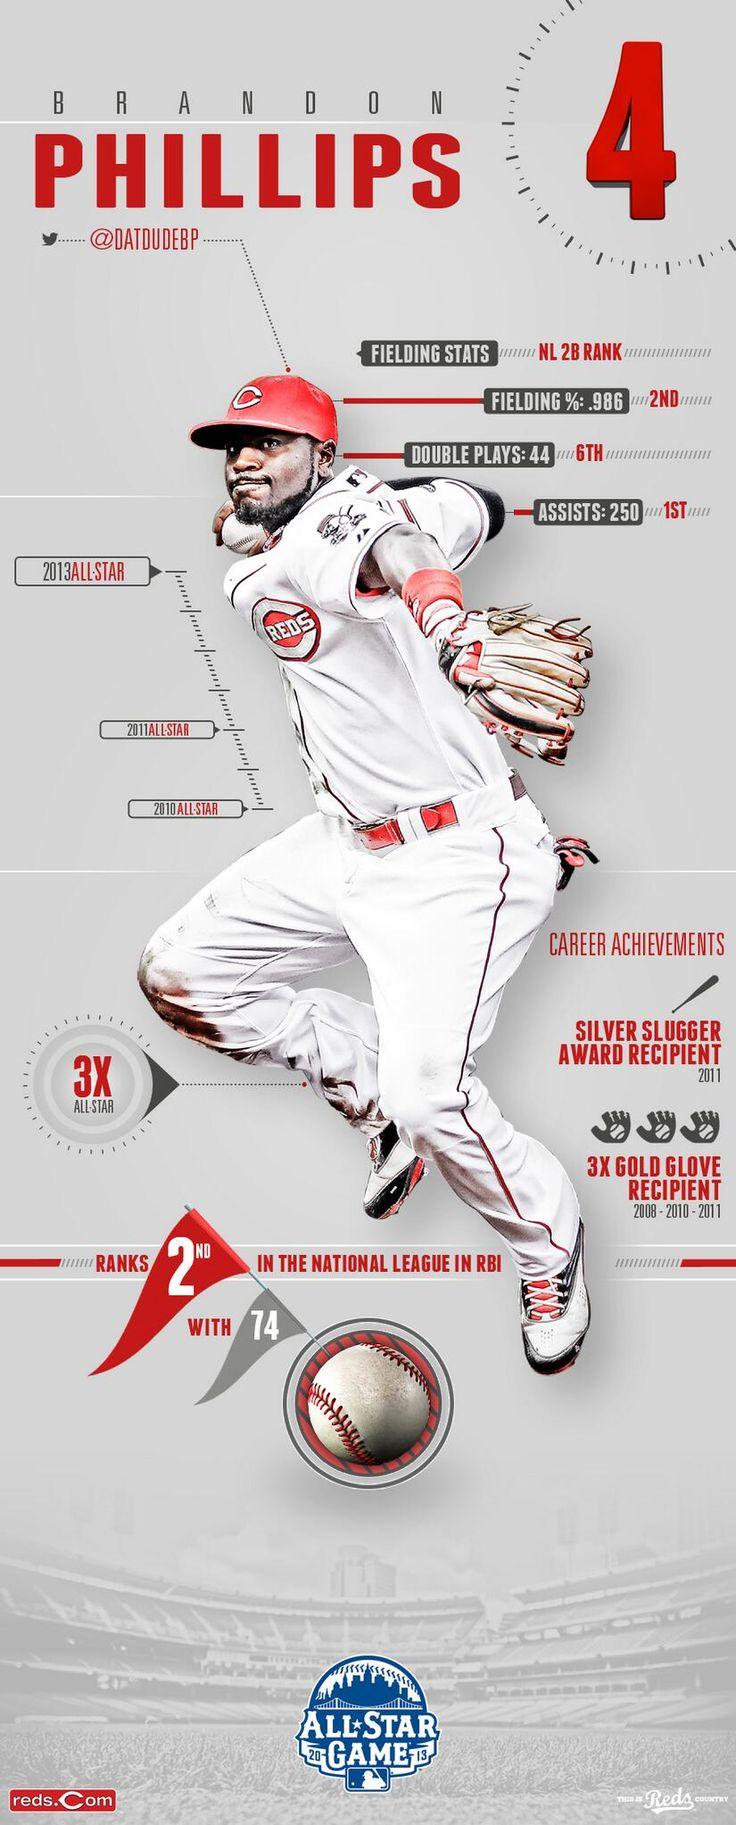 Cincinnati Reds on | Graphic Design | Pinterest | Infographic, Design and Graphic Design